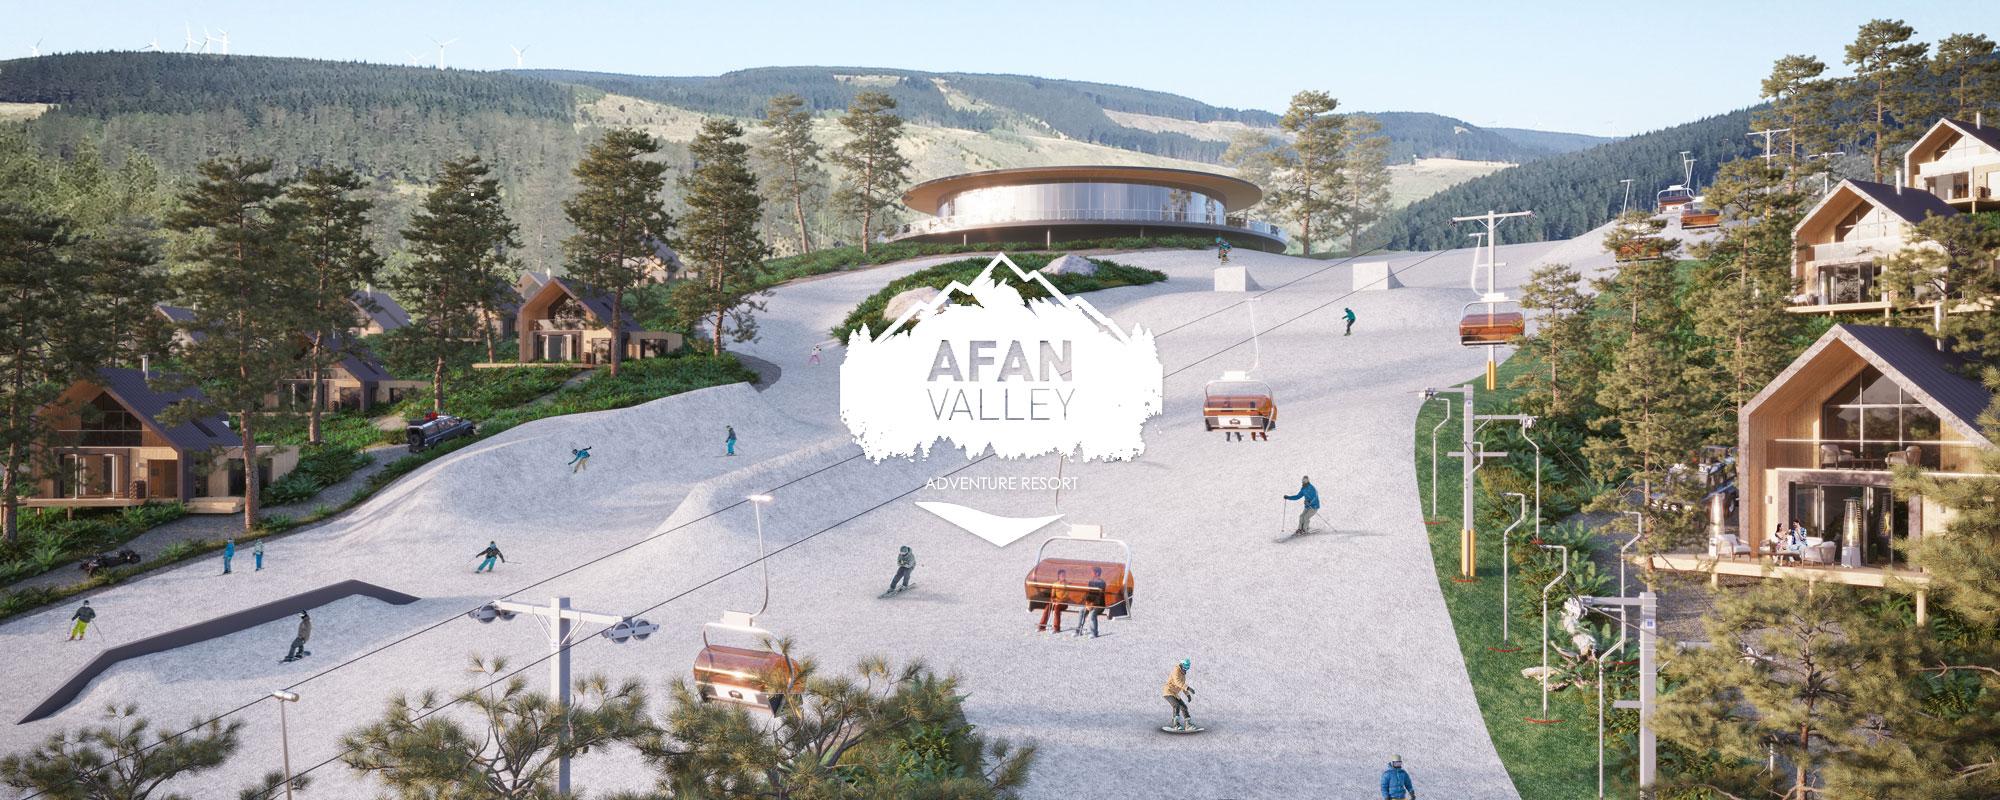 Afan Valley Adventure Resort Alpine Zone ski slope